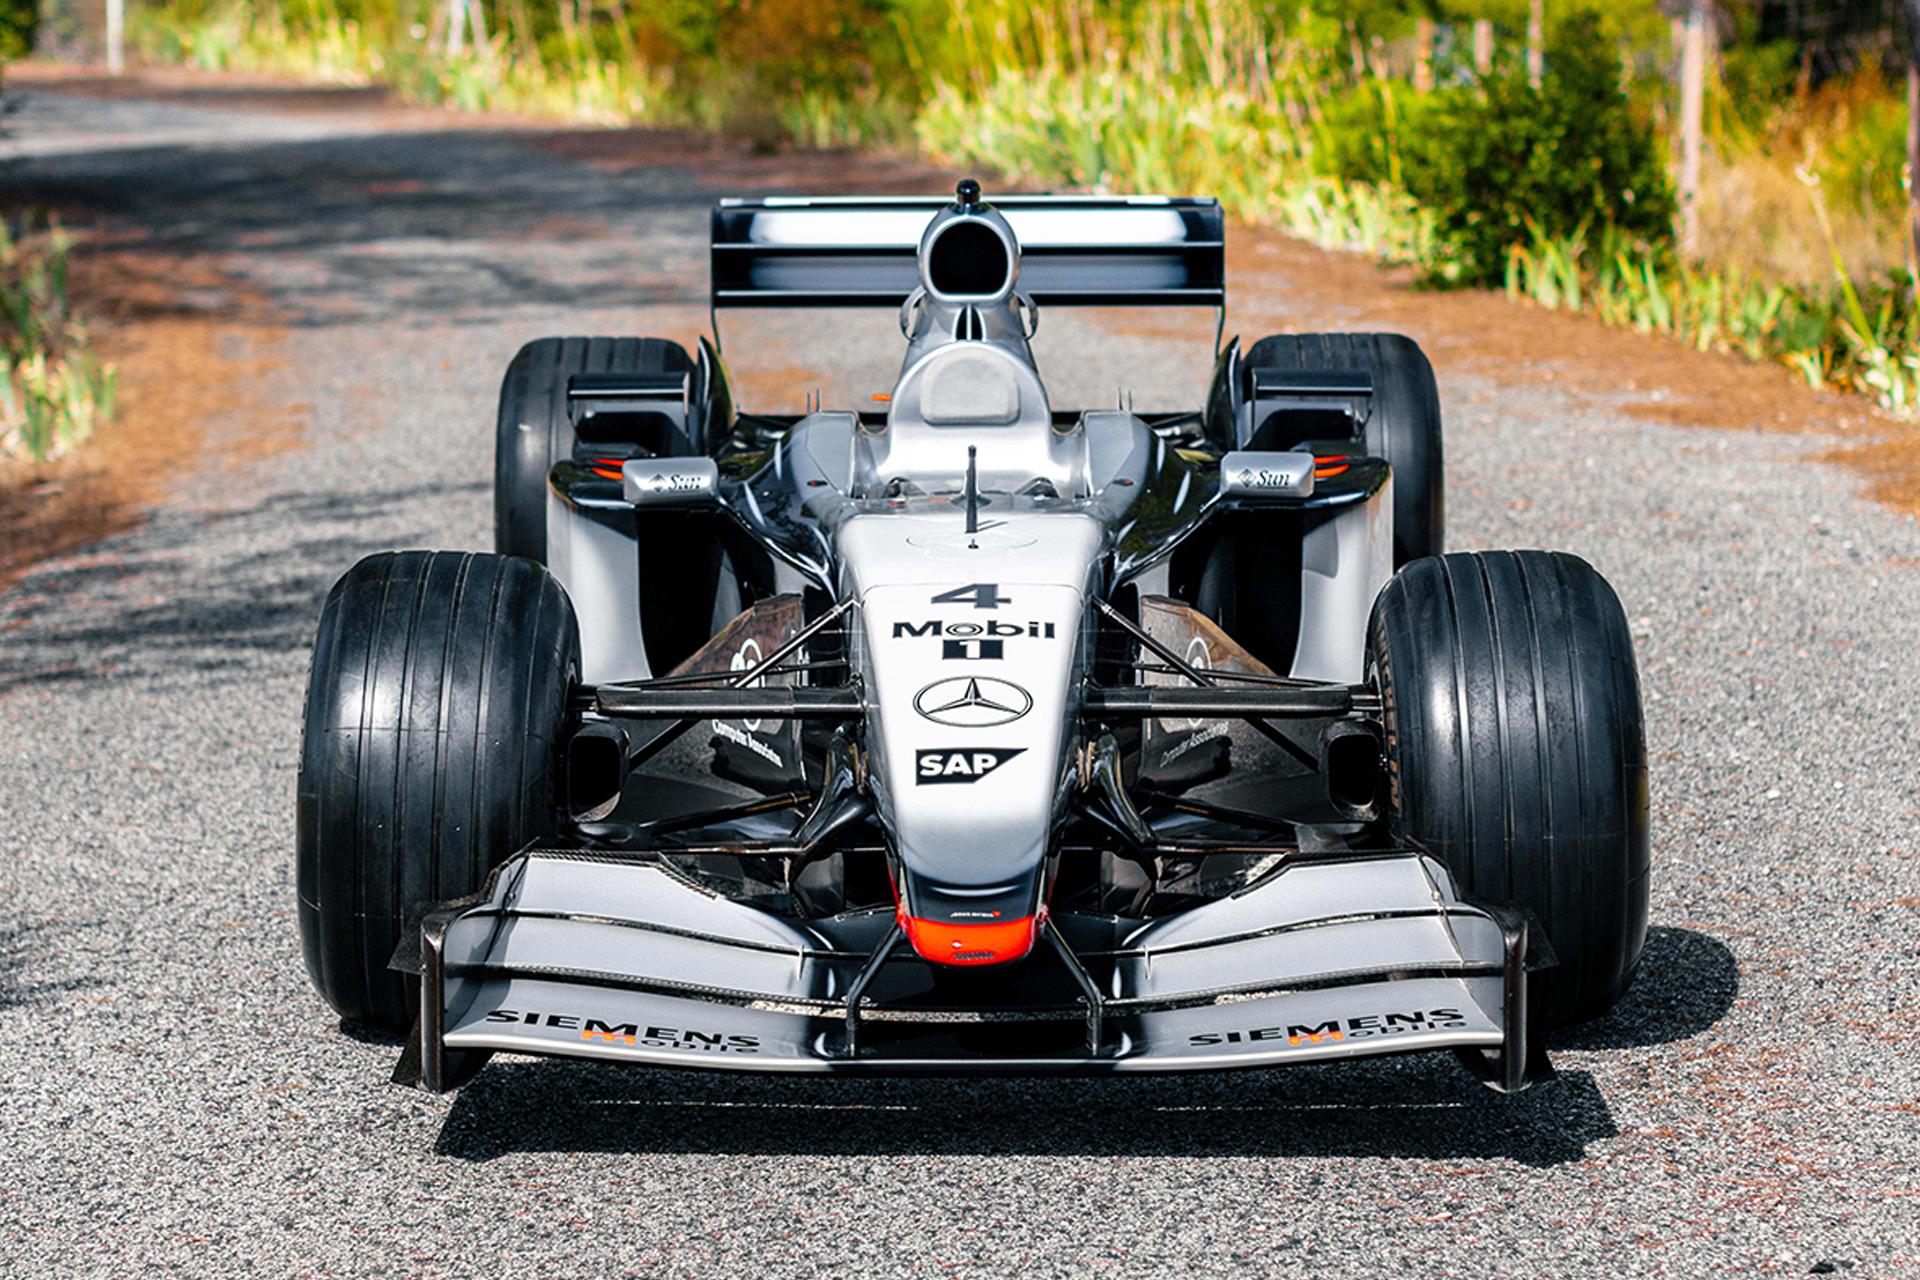 2002 McLaren MP4 17D